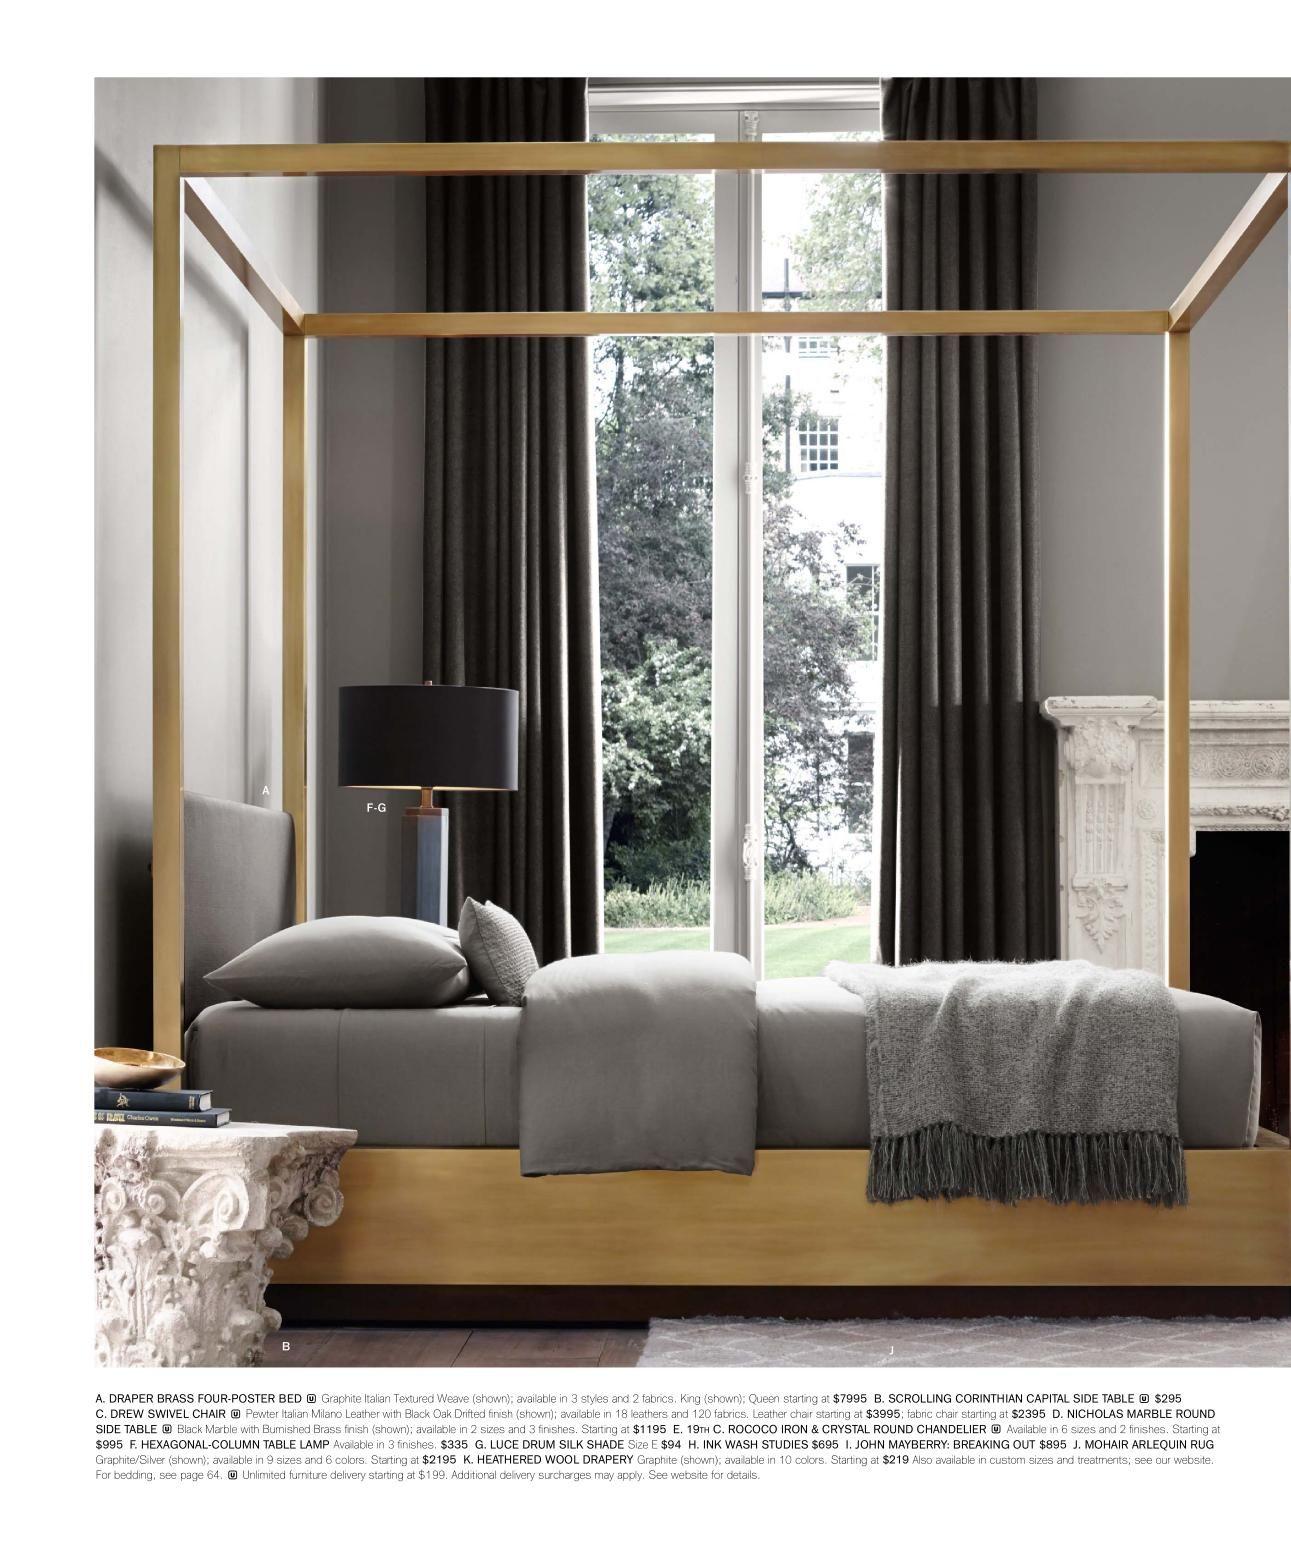 Rh source books space 10 bed room pinterest for Casa minimalista barcelona capital